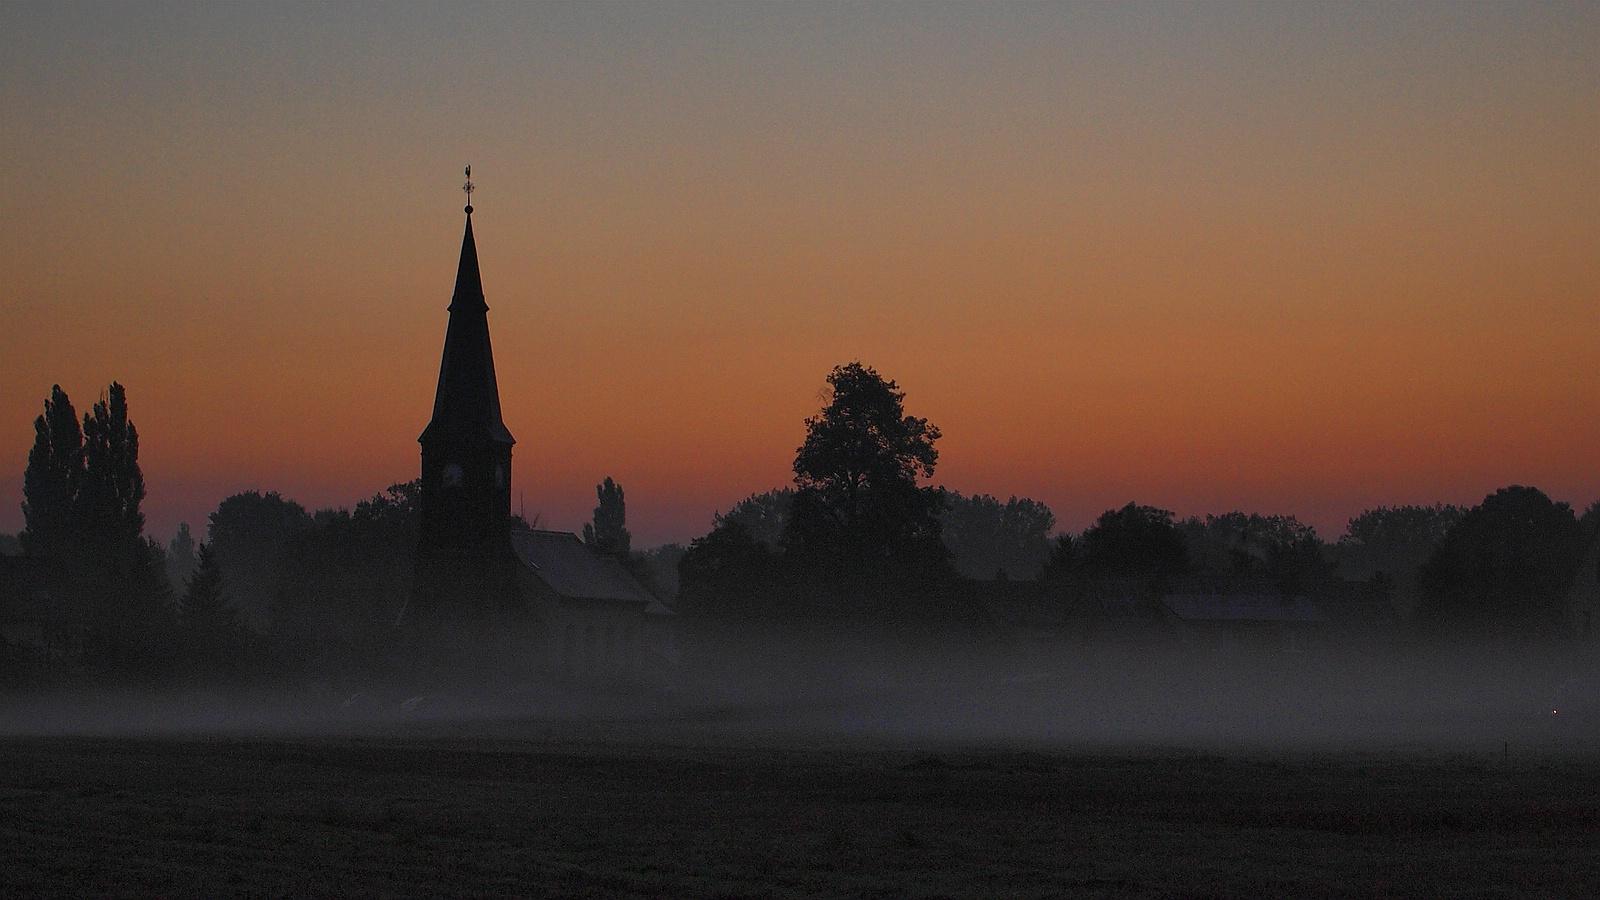 Kirche - morgens auf dem Land